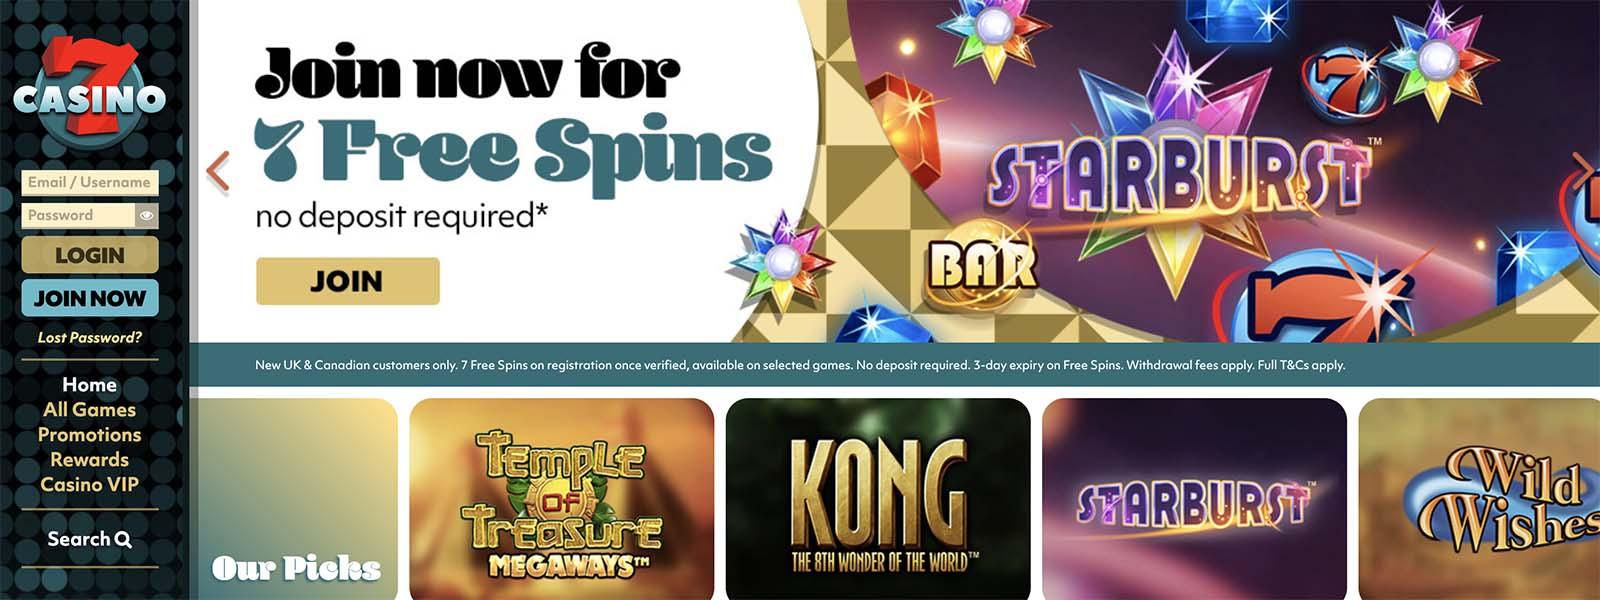 Expired Promo Casino 44745